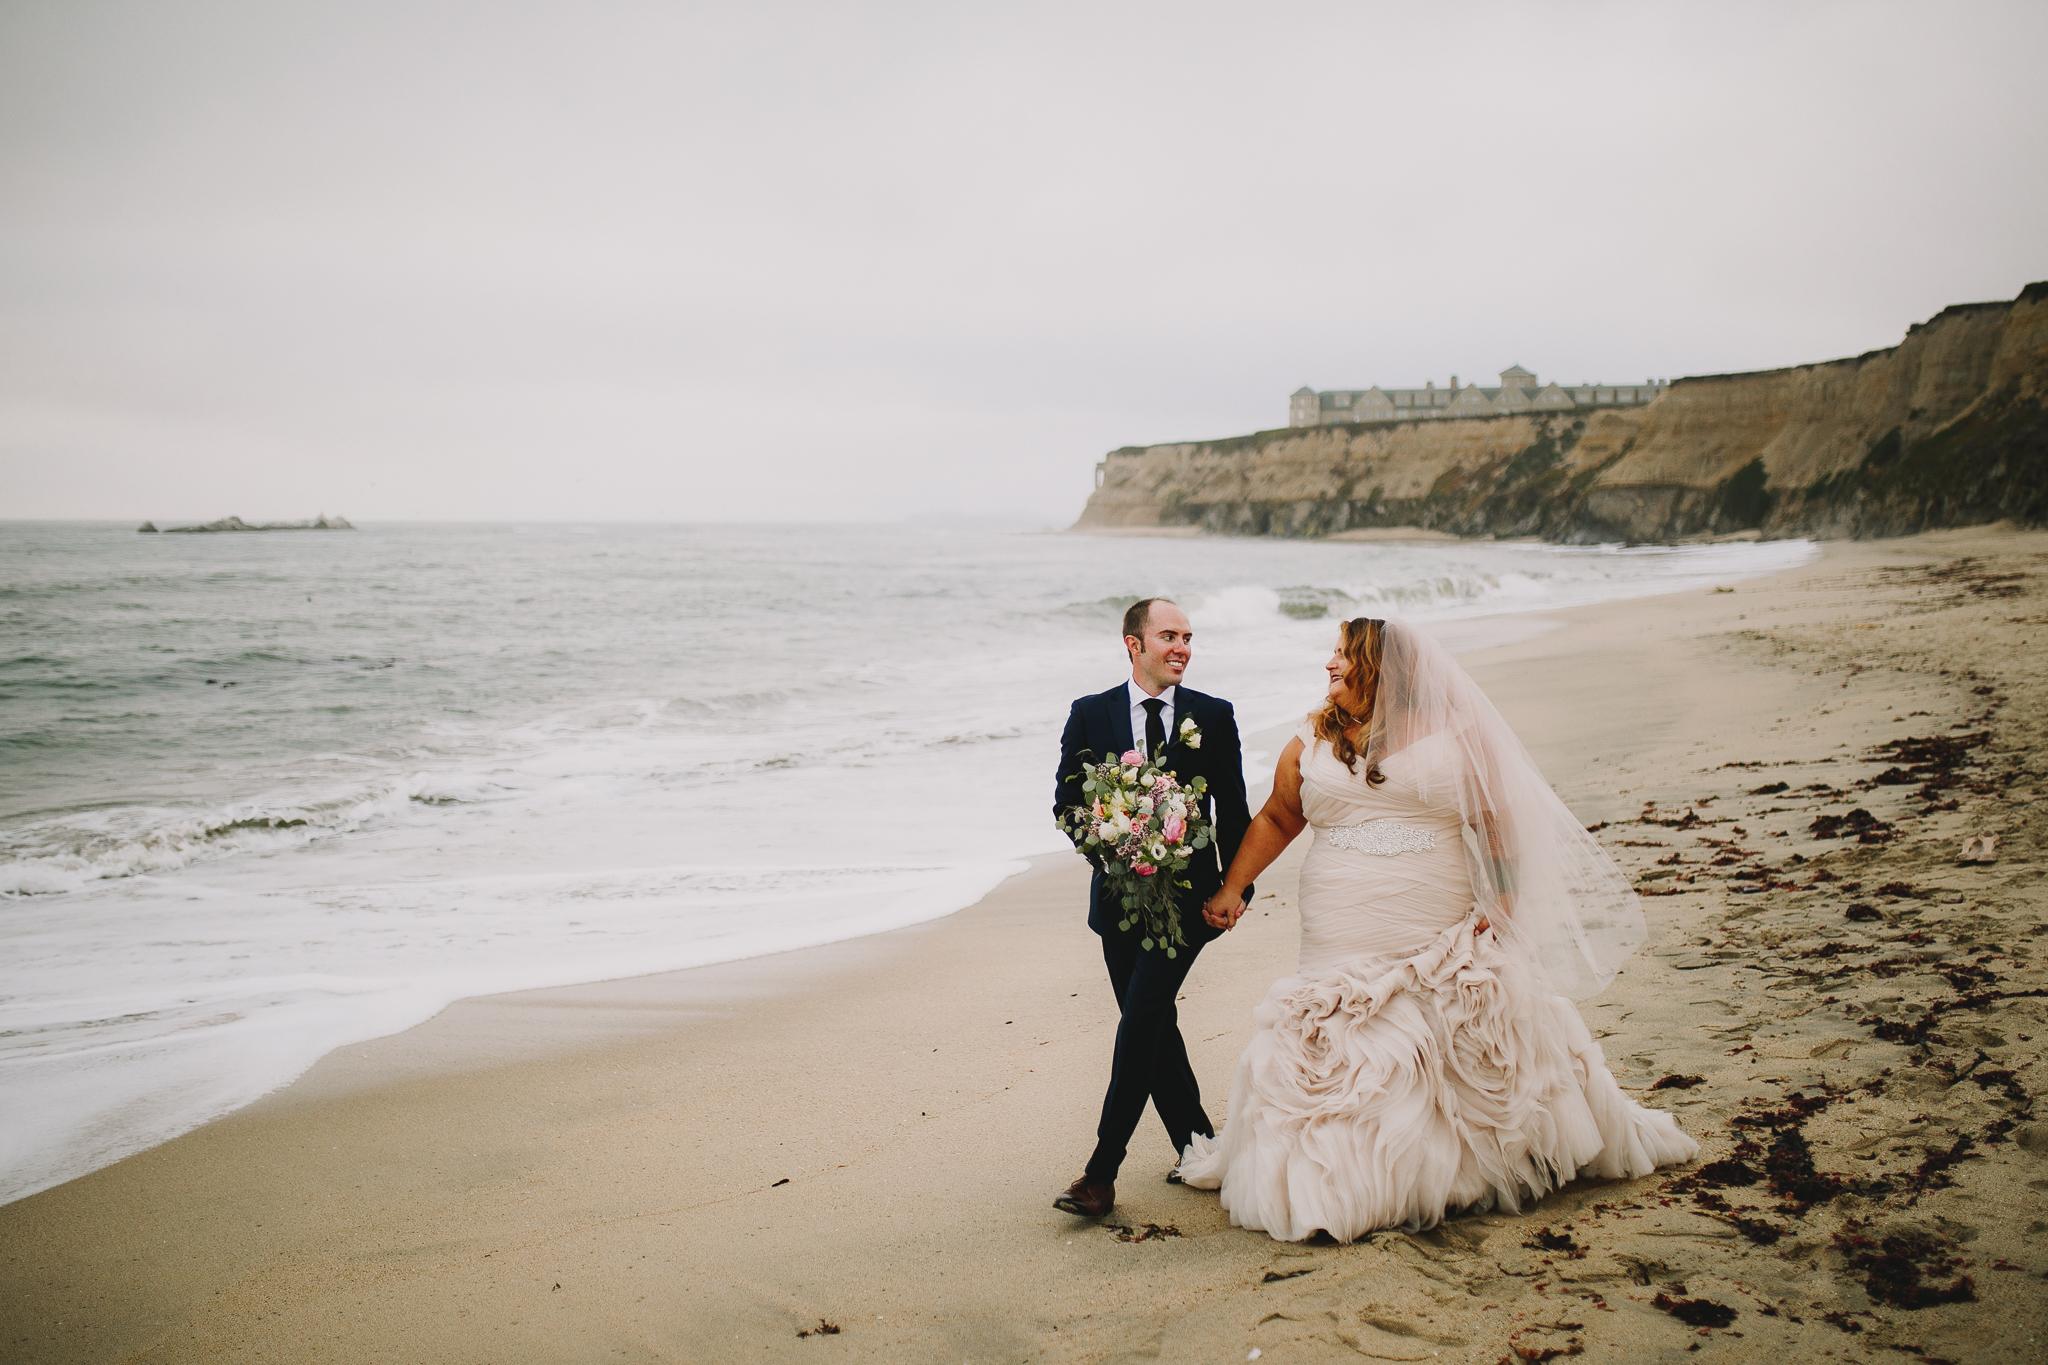 Archer_Inspired_Photography_Ritz_Carlton_Half_Moon_Bay_Wedding-144.jpg